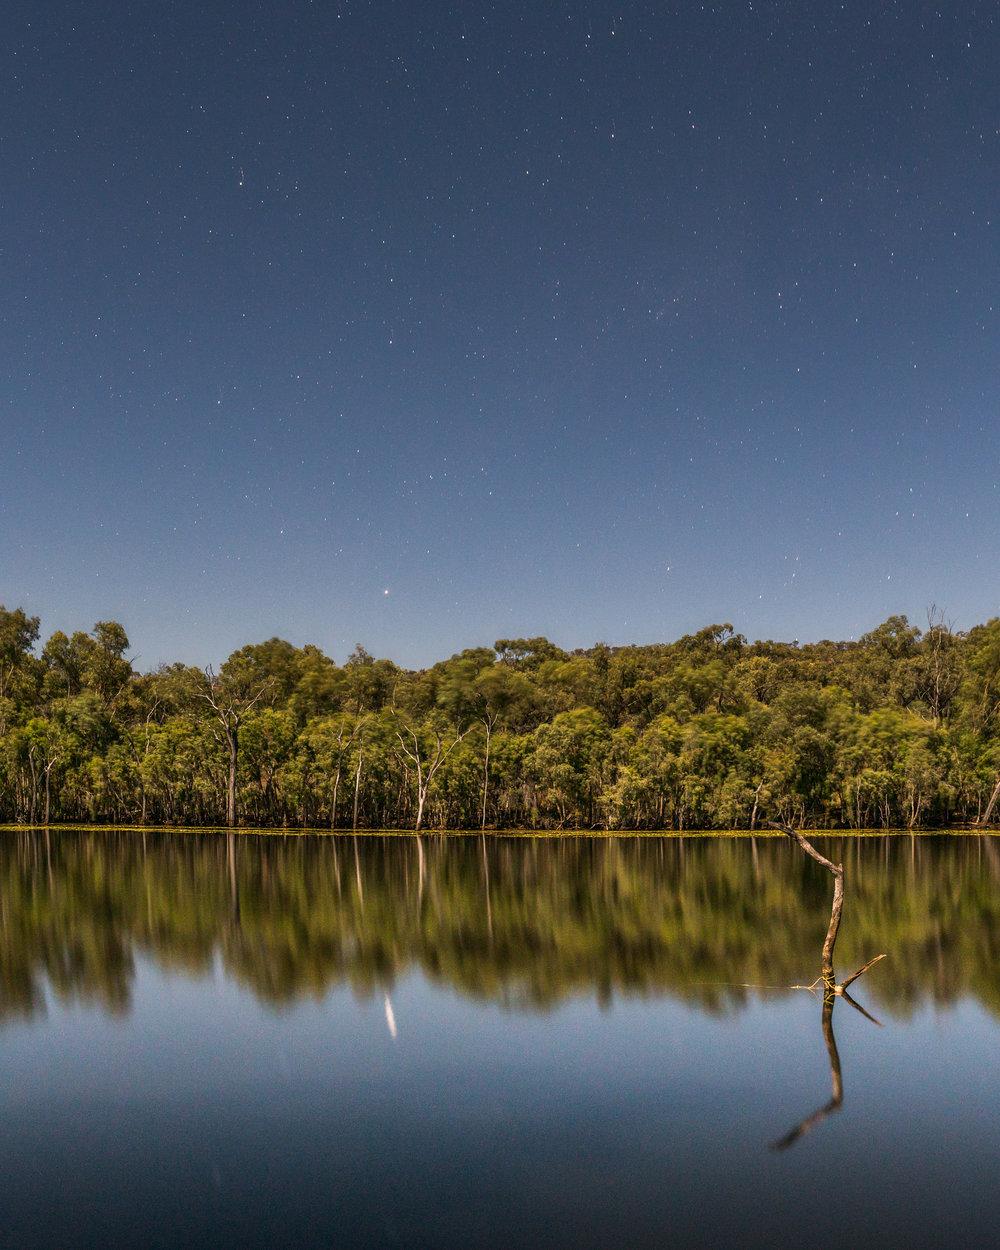 Lanscapes - North - Queensland - Astro - Night - Stars - Full Moon.jpg